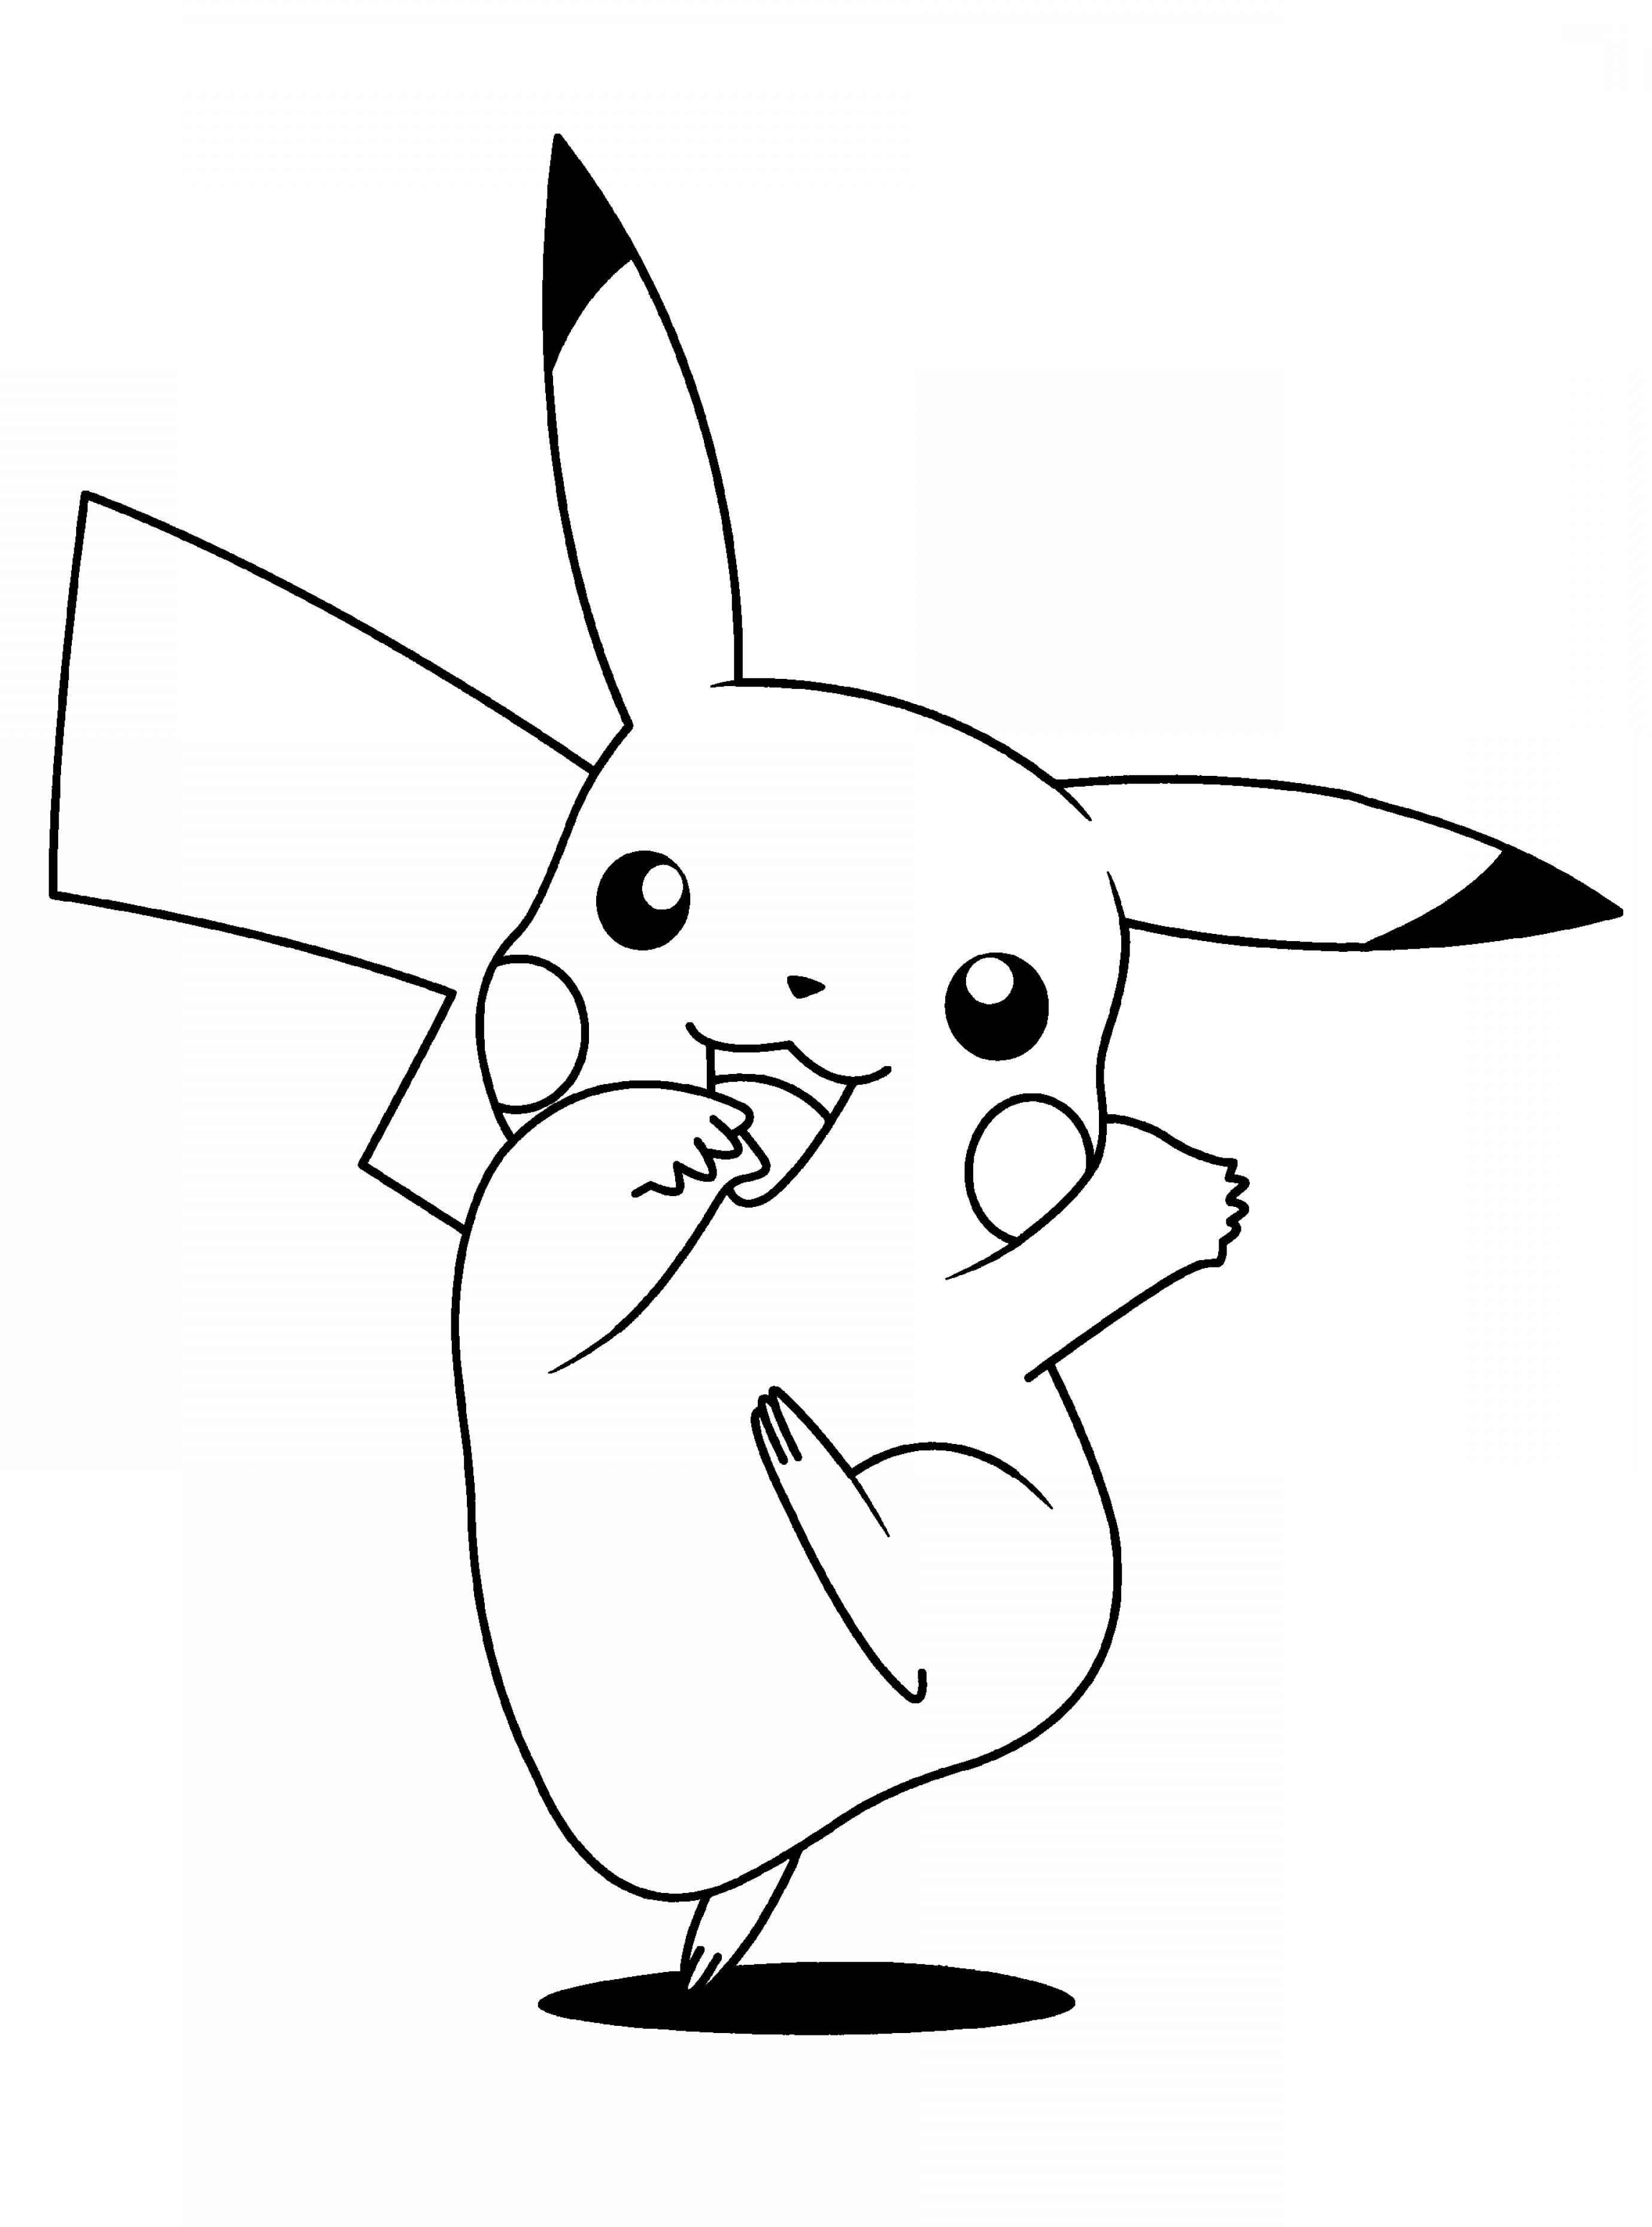 Black and white pokemon clipart picture free Pikachu Vector Black And White   inIIkim picture free